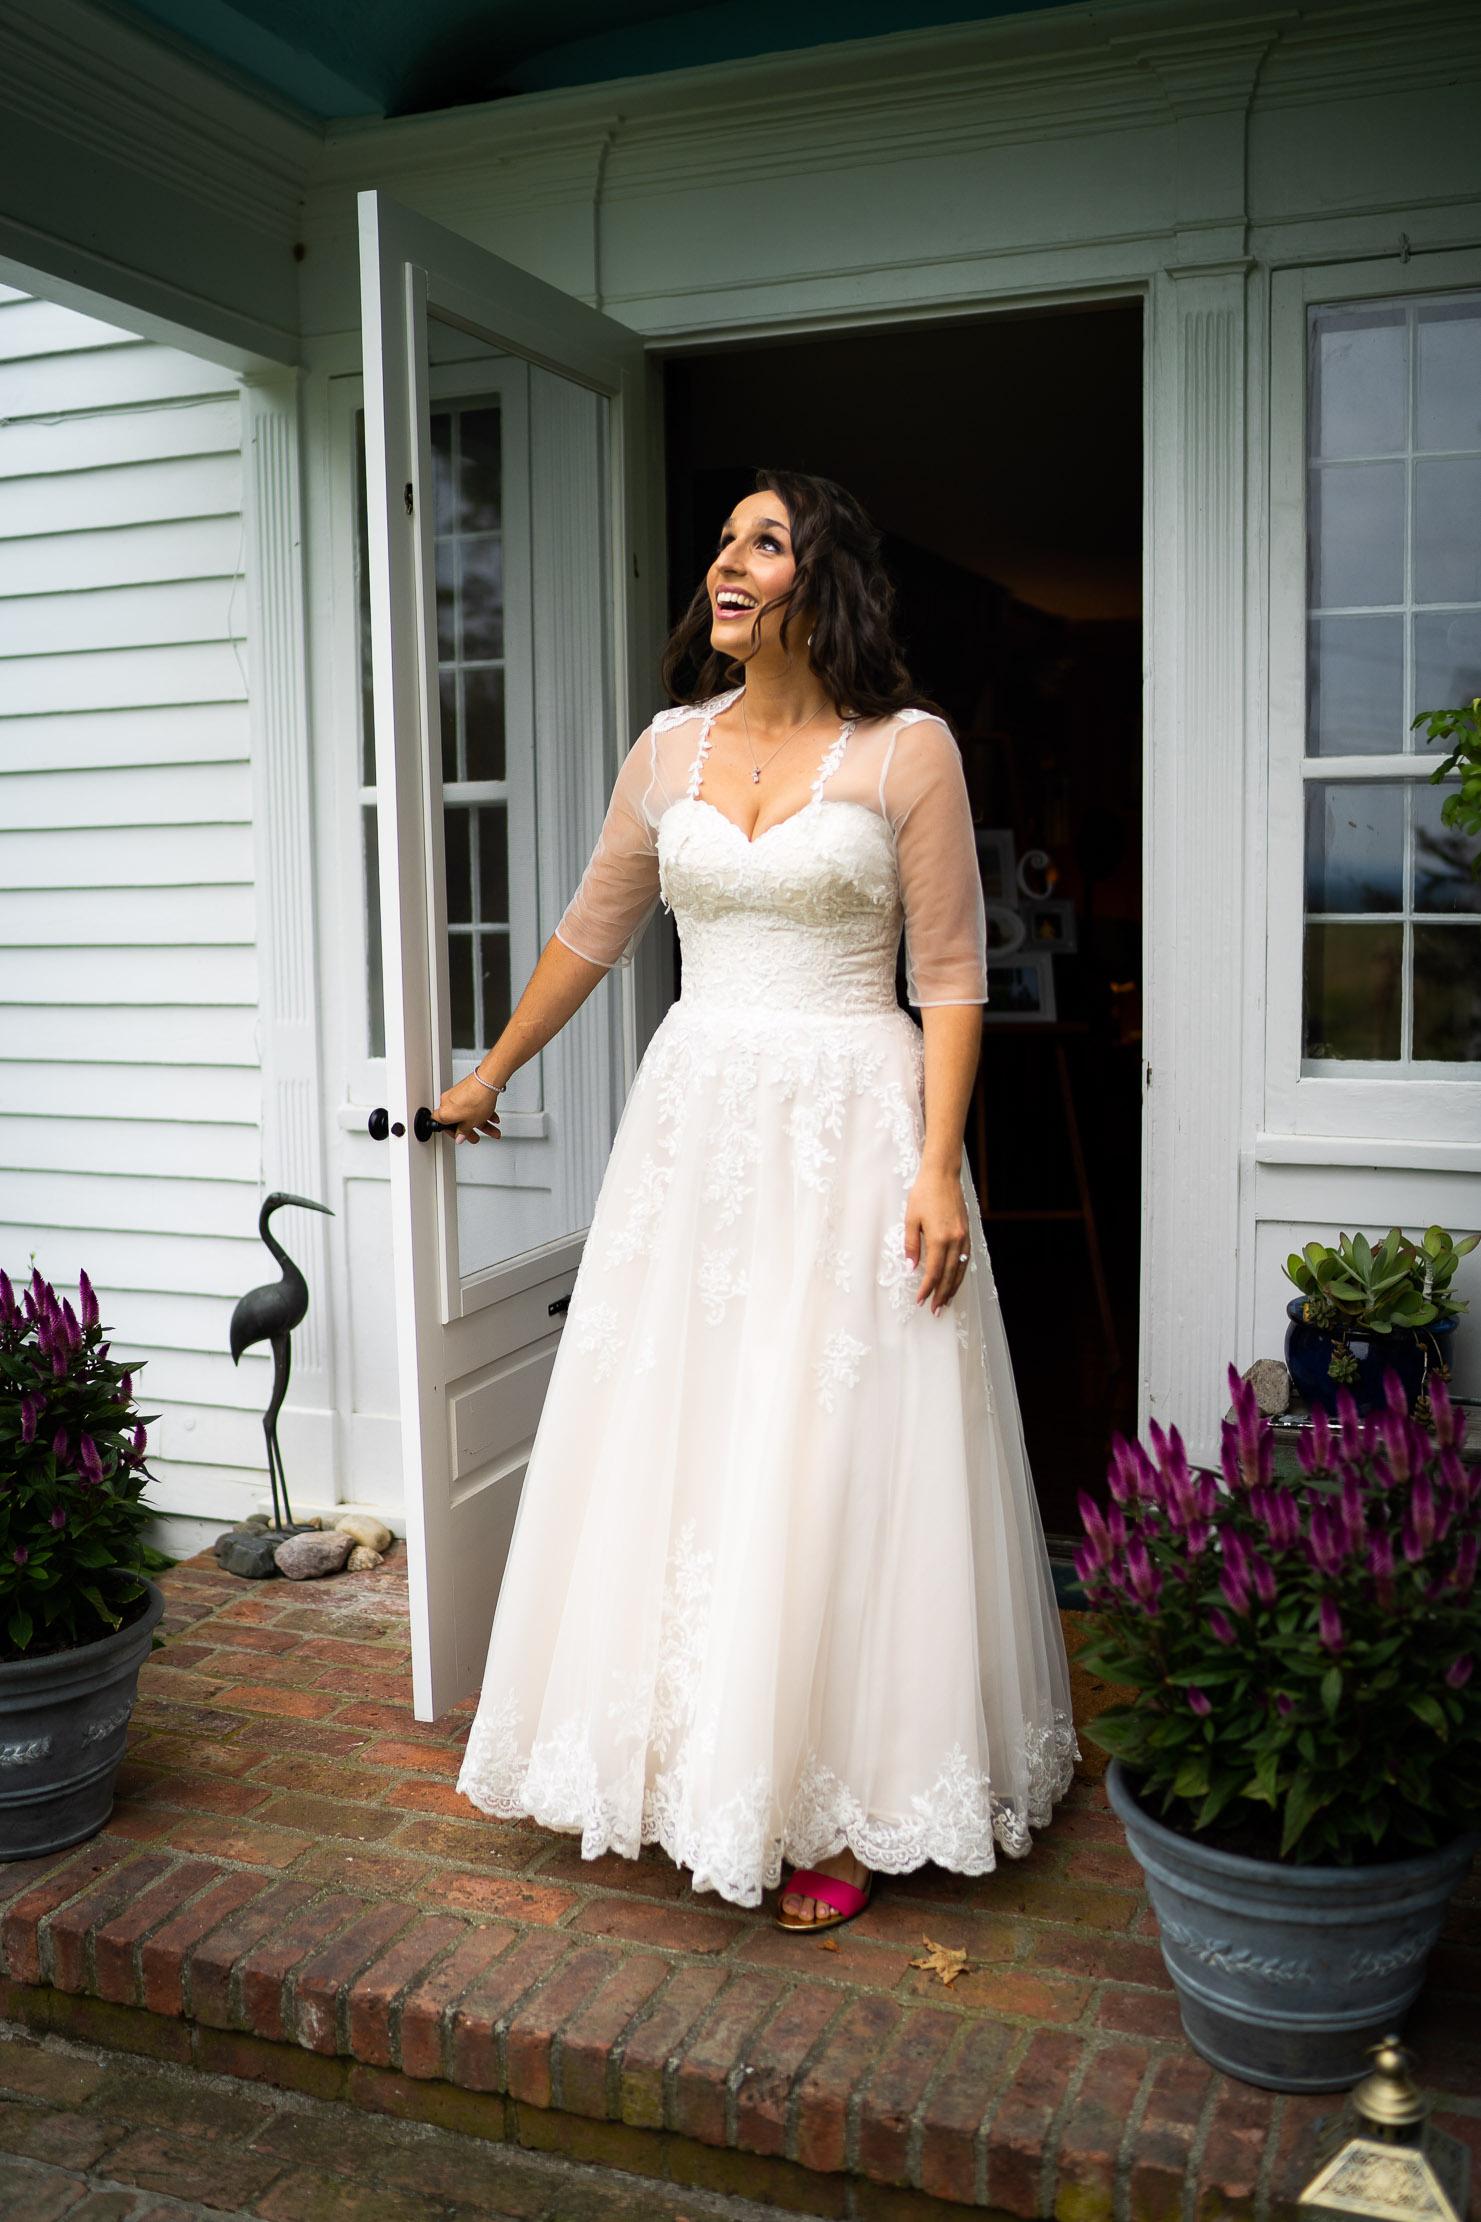 Wings-Castle-Millbrook-NY-Upstate-Wedding-Photographer-1027.jpg